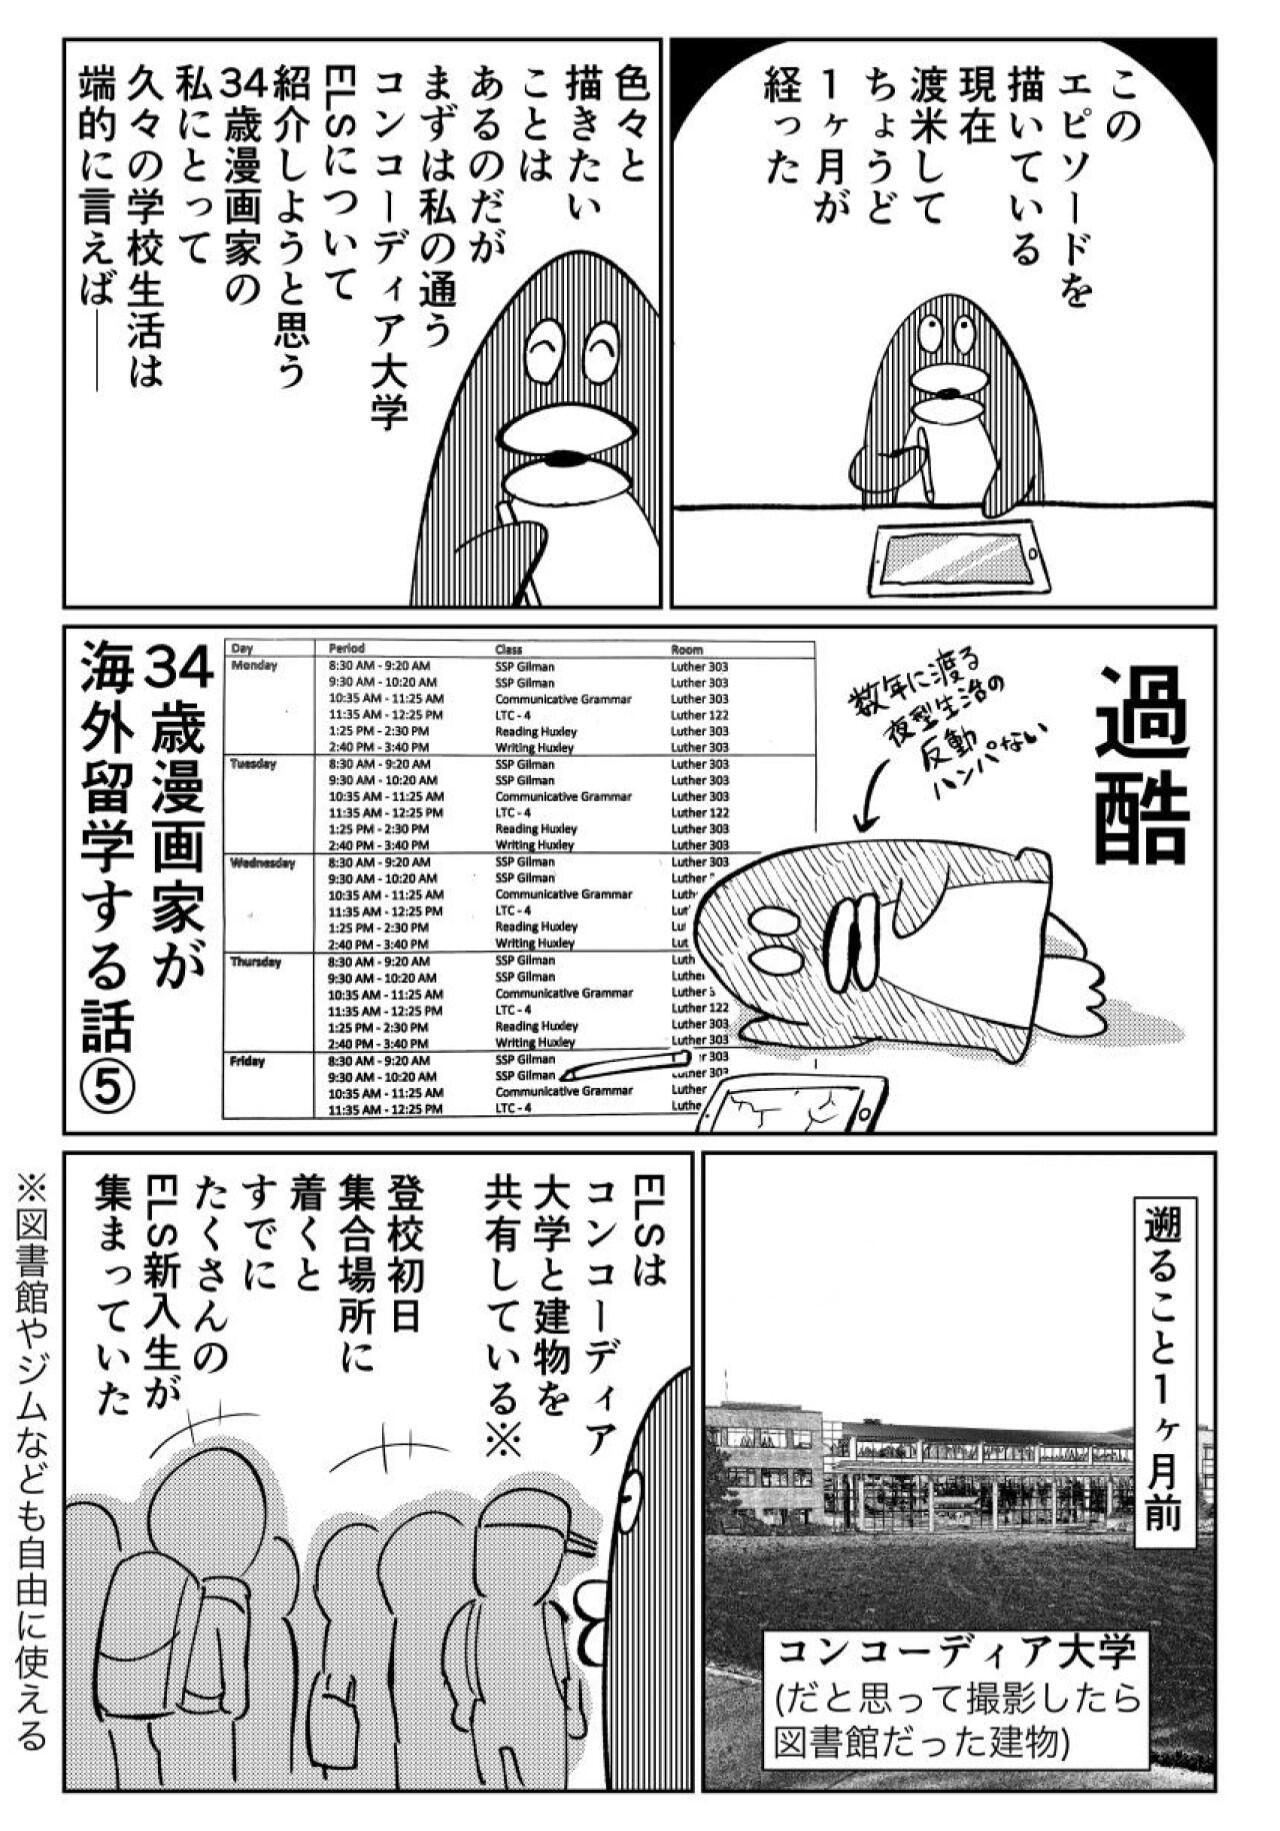 https://www.ryugaku.co.jp/column/images/34sai5_1_1280.jpg